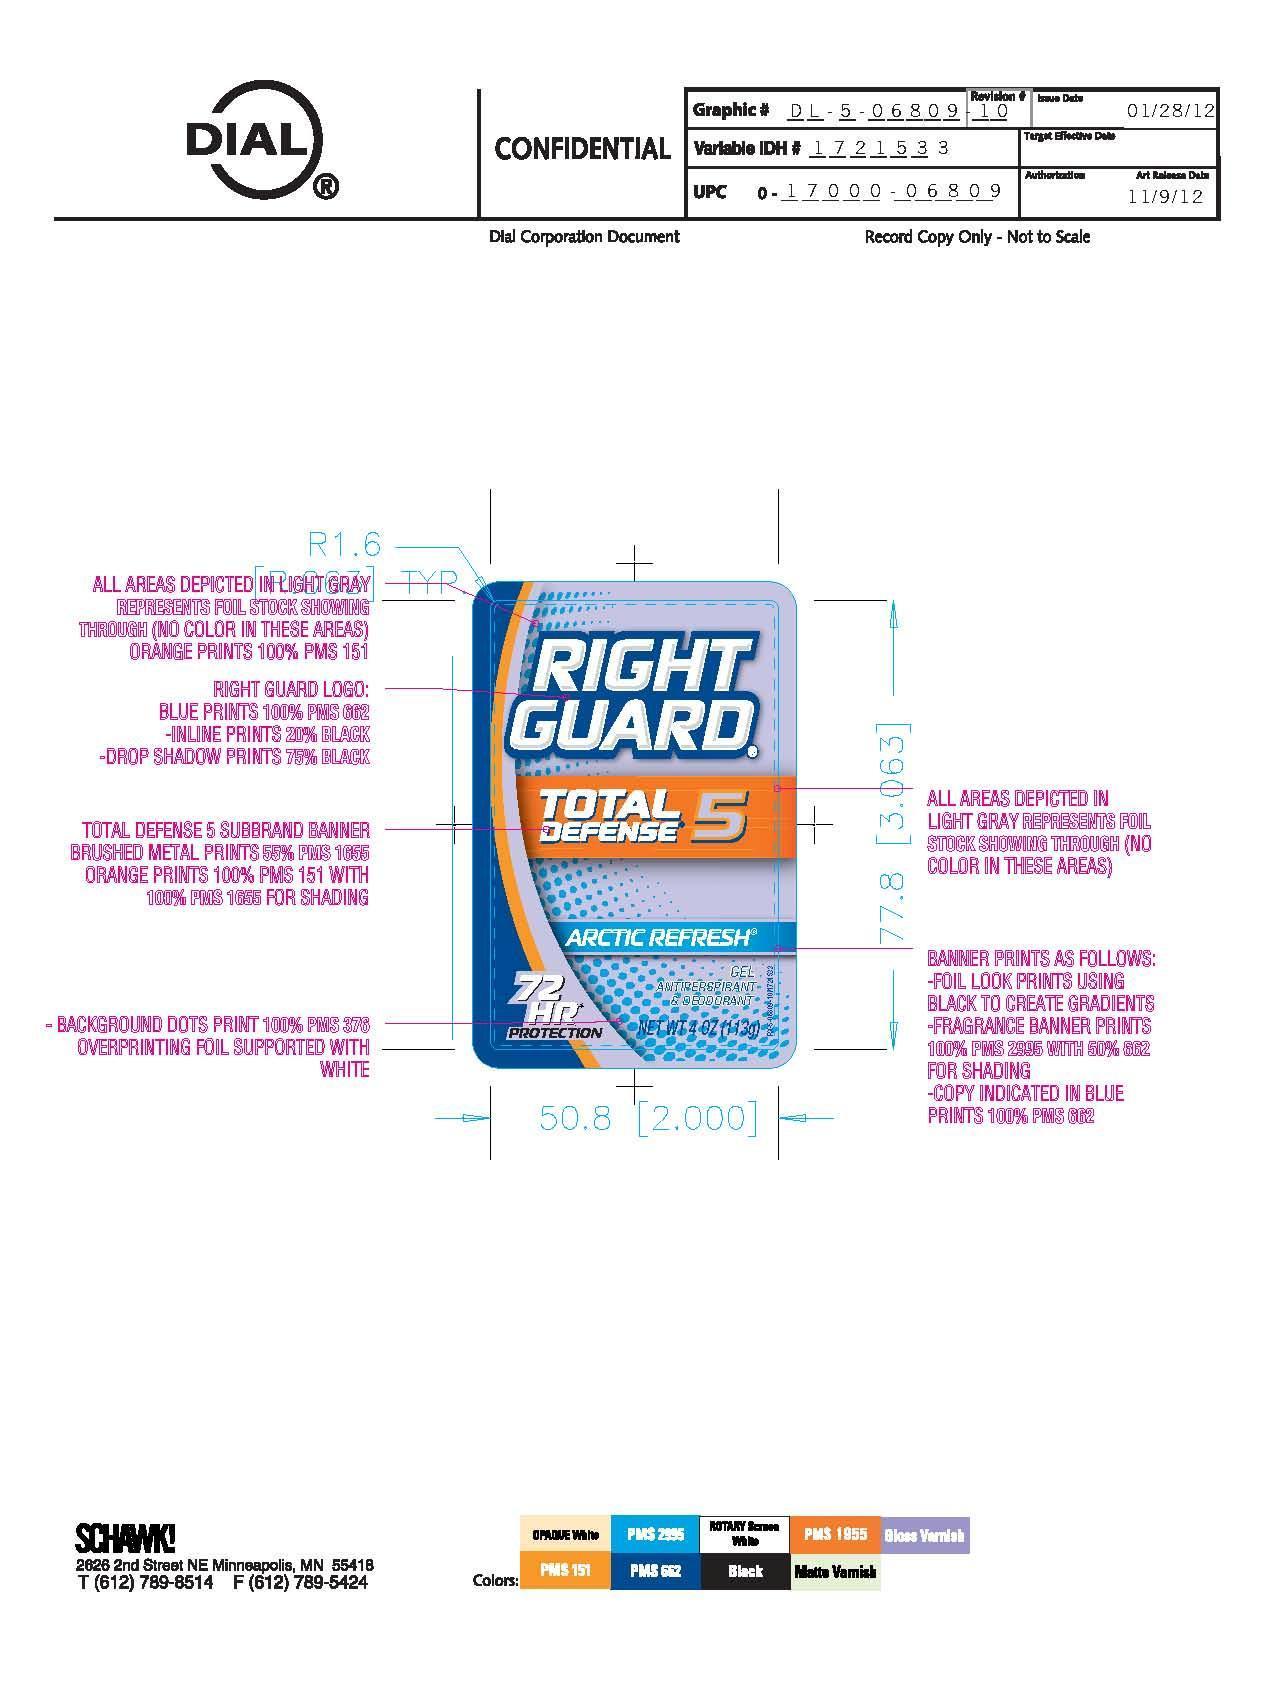 Right Guard Total Defense 5 Arctic Refresh (Aluminum Zirconium Octachlorhydrex Gly) Gel [Vvf Illinois Services Llc]